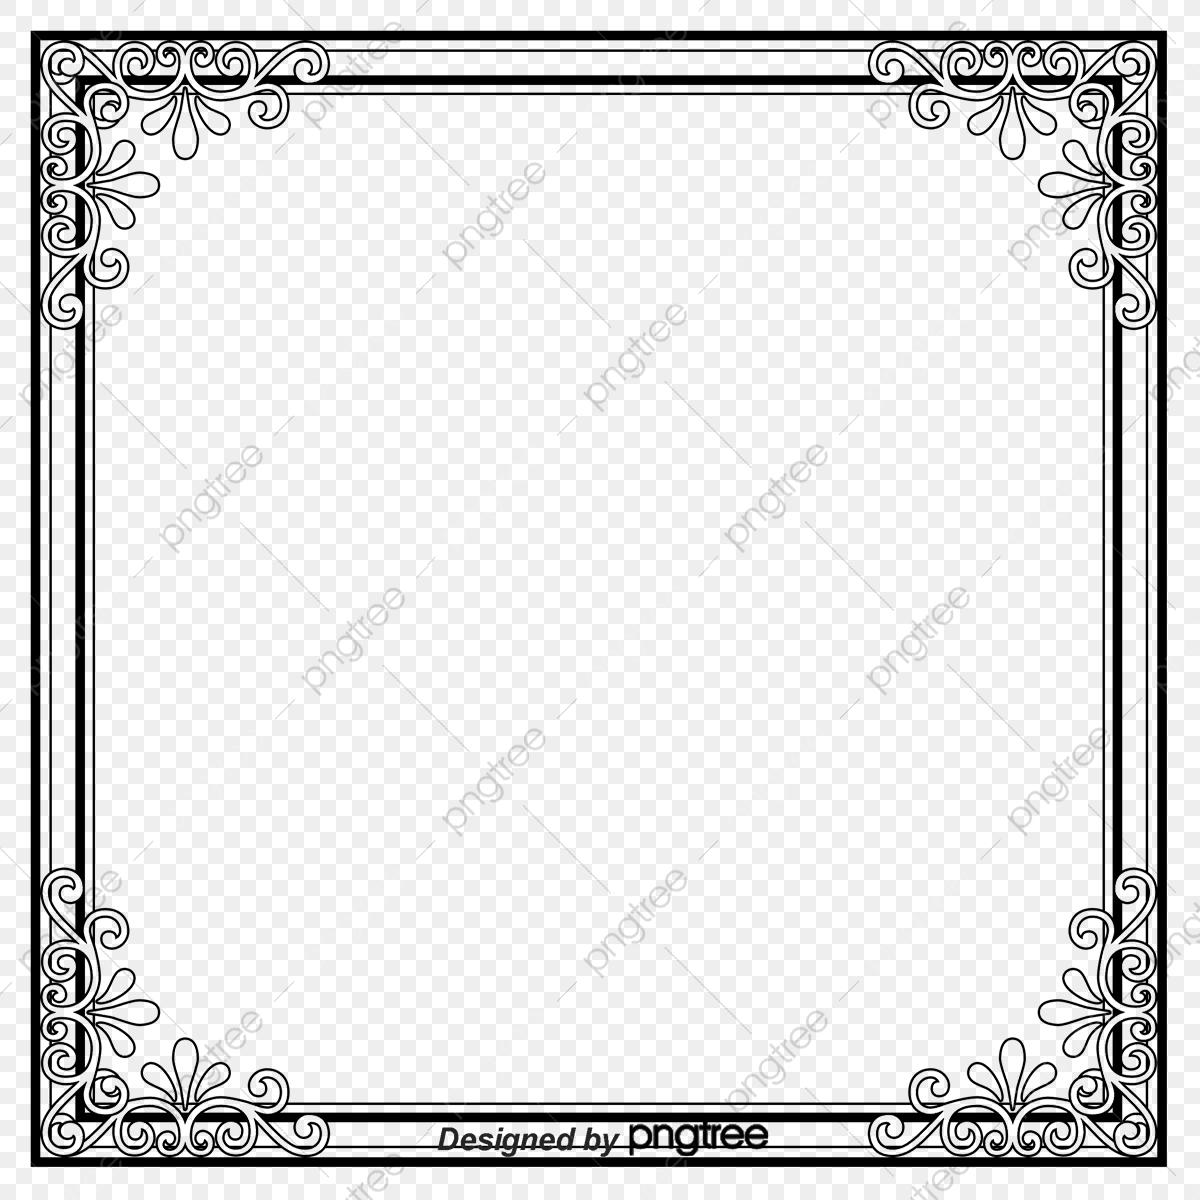 Picture Frame Vector Free Download, Border Frame, Shading.